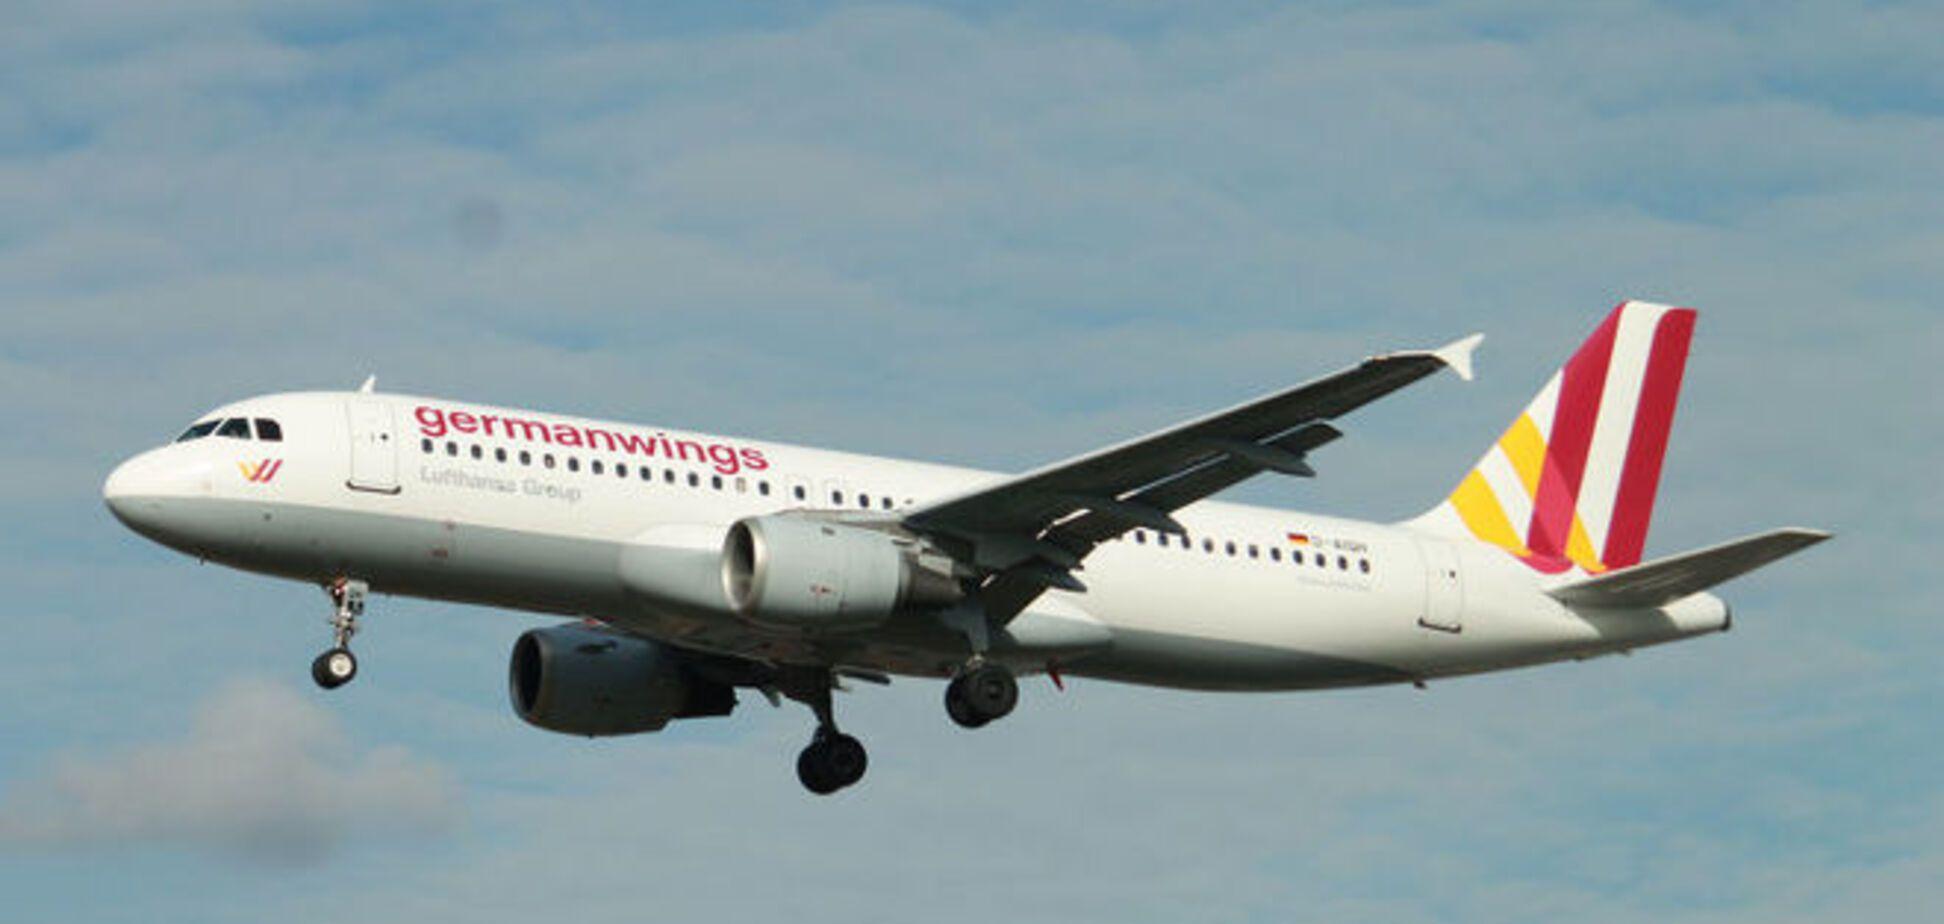 Во Франции разбился Airbus со 148 людьми на борту